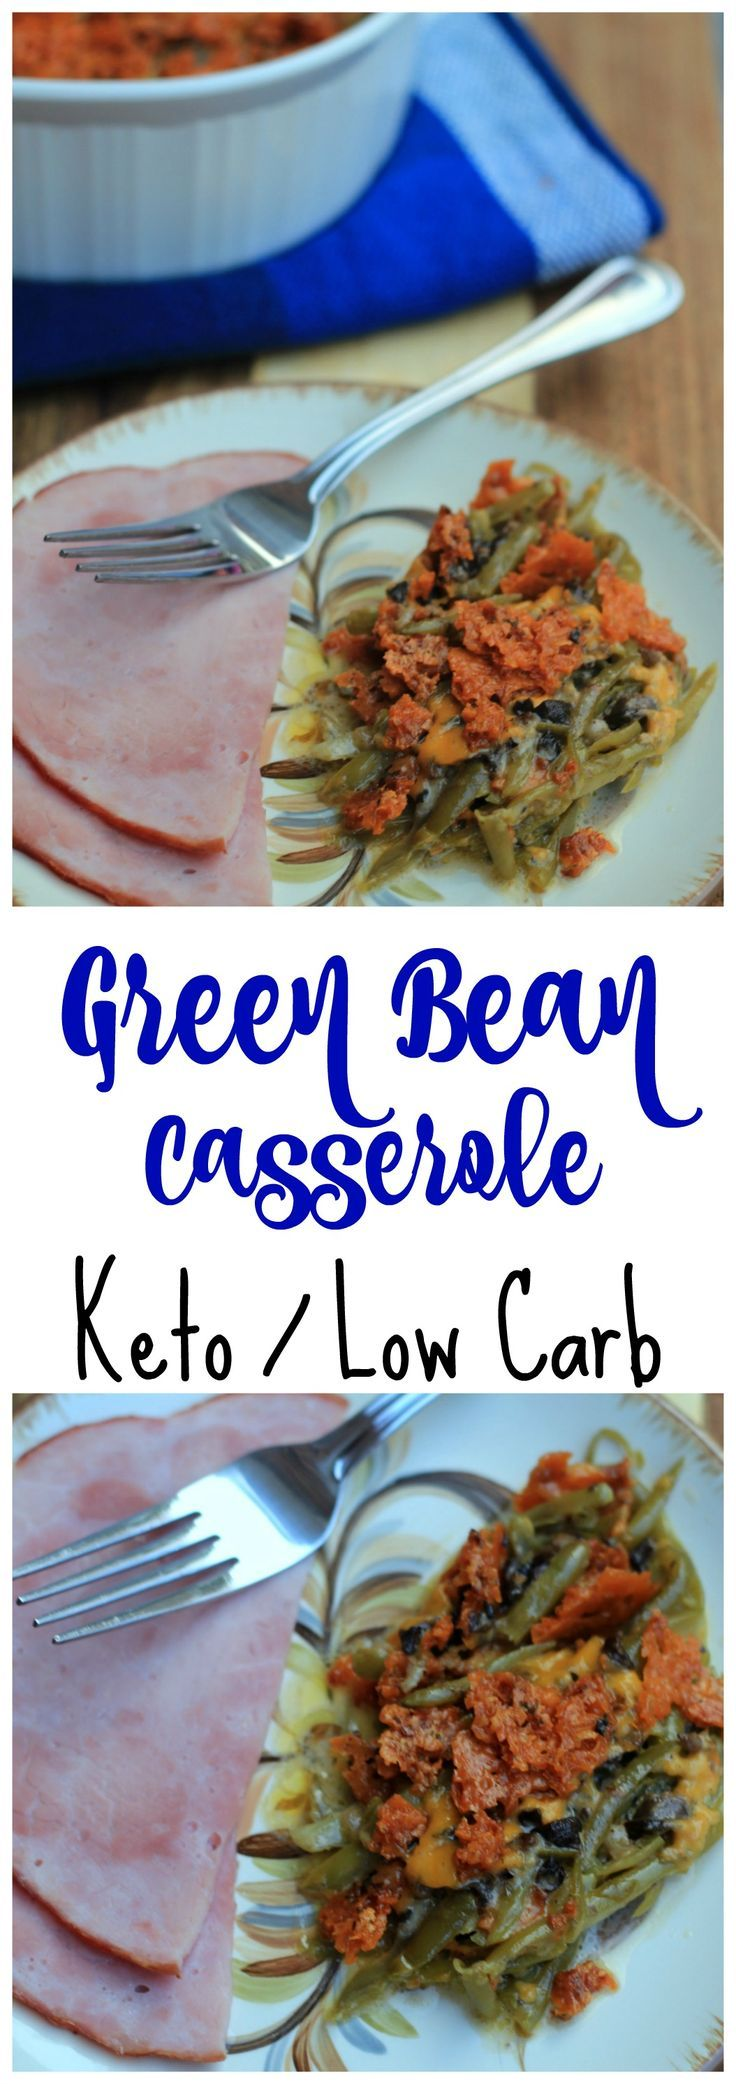 Green Bean Casserole / Keto & Low Carb/ Keto Green Bean Casserole/ Low Carb Green Bean Casserole / Keto Casserole / Low Carb Casserole / Keto veggie dish / low carb veggie dish / Keto Thanksgiving recipe / Low Carb Thanksgiving Recipe / Keto Recipes / Low Carb Recipes #keto #lchf #lowcarb #ketogenic #greenbeancasserole #kaseytrenum